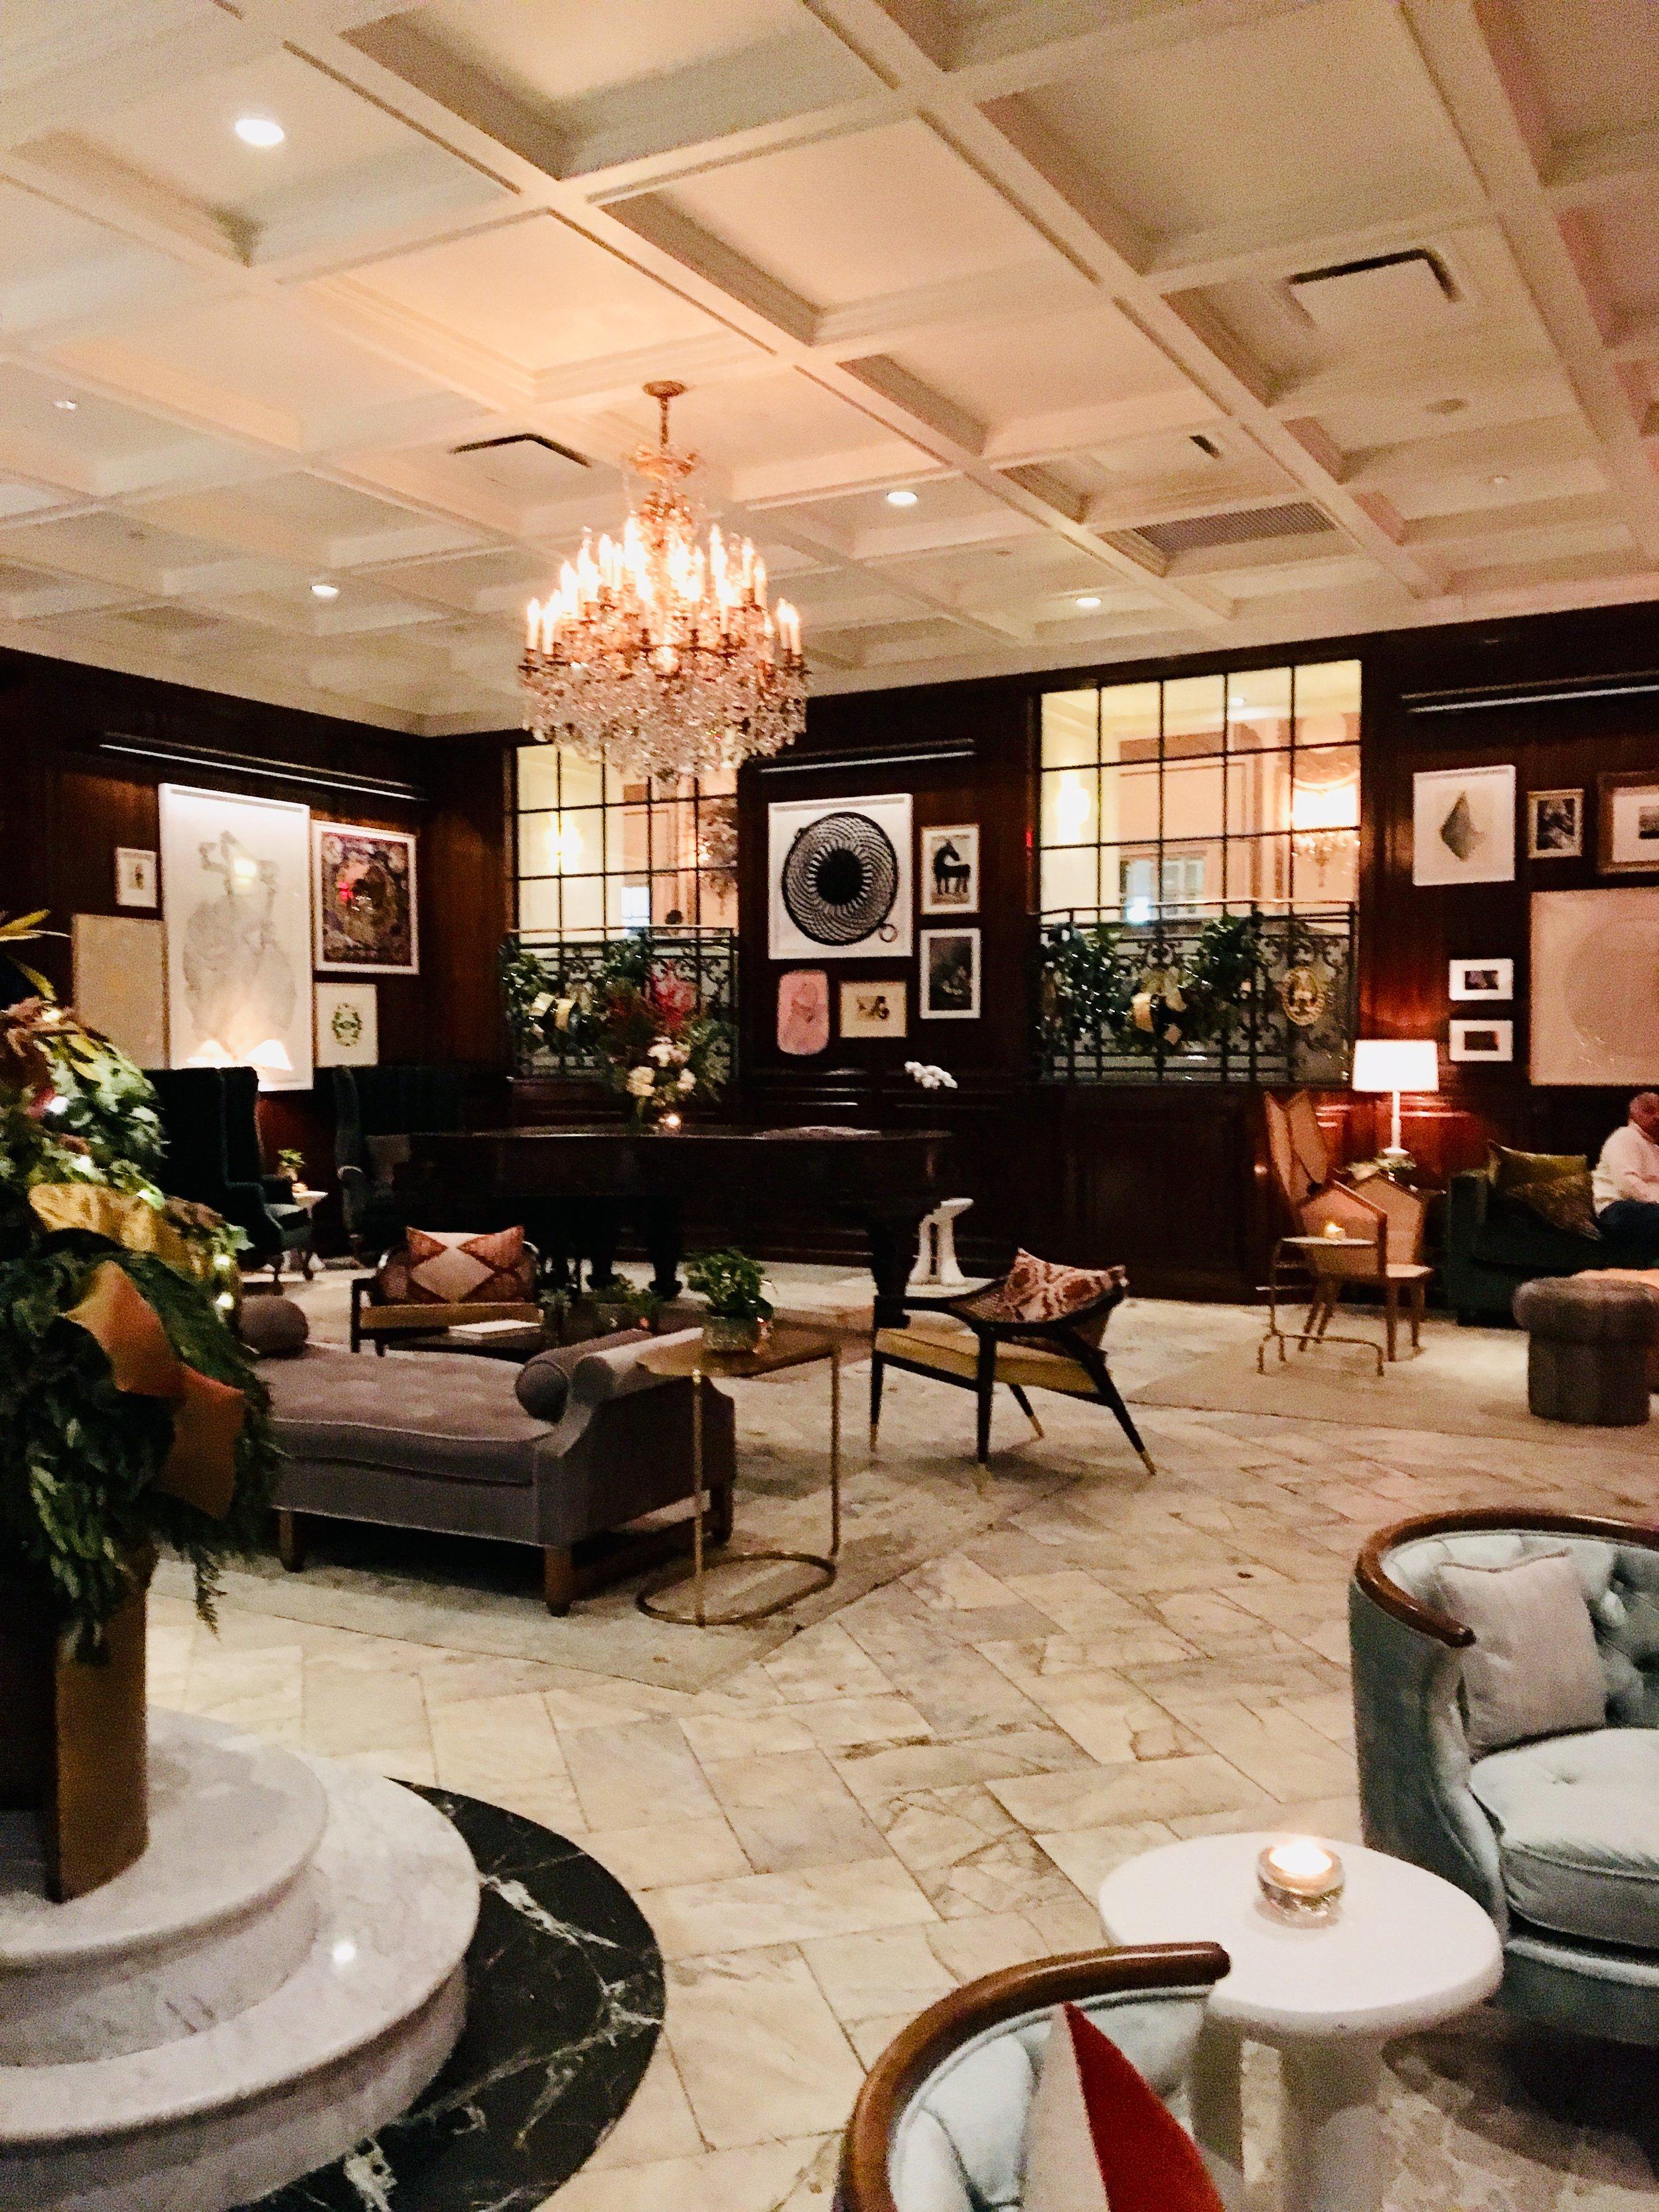 Adolphus Lounge where we perform